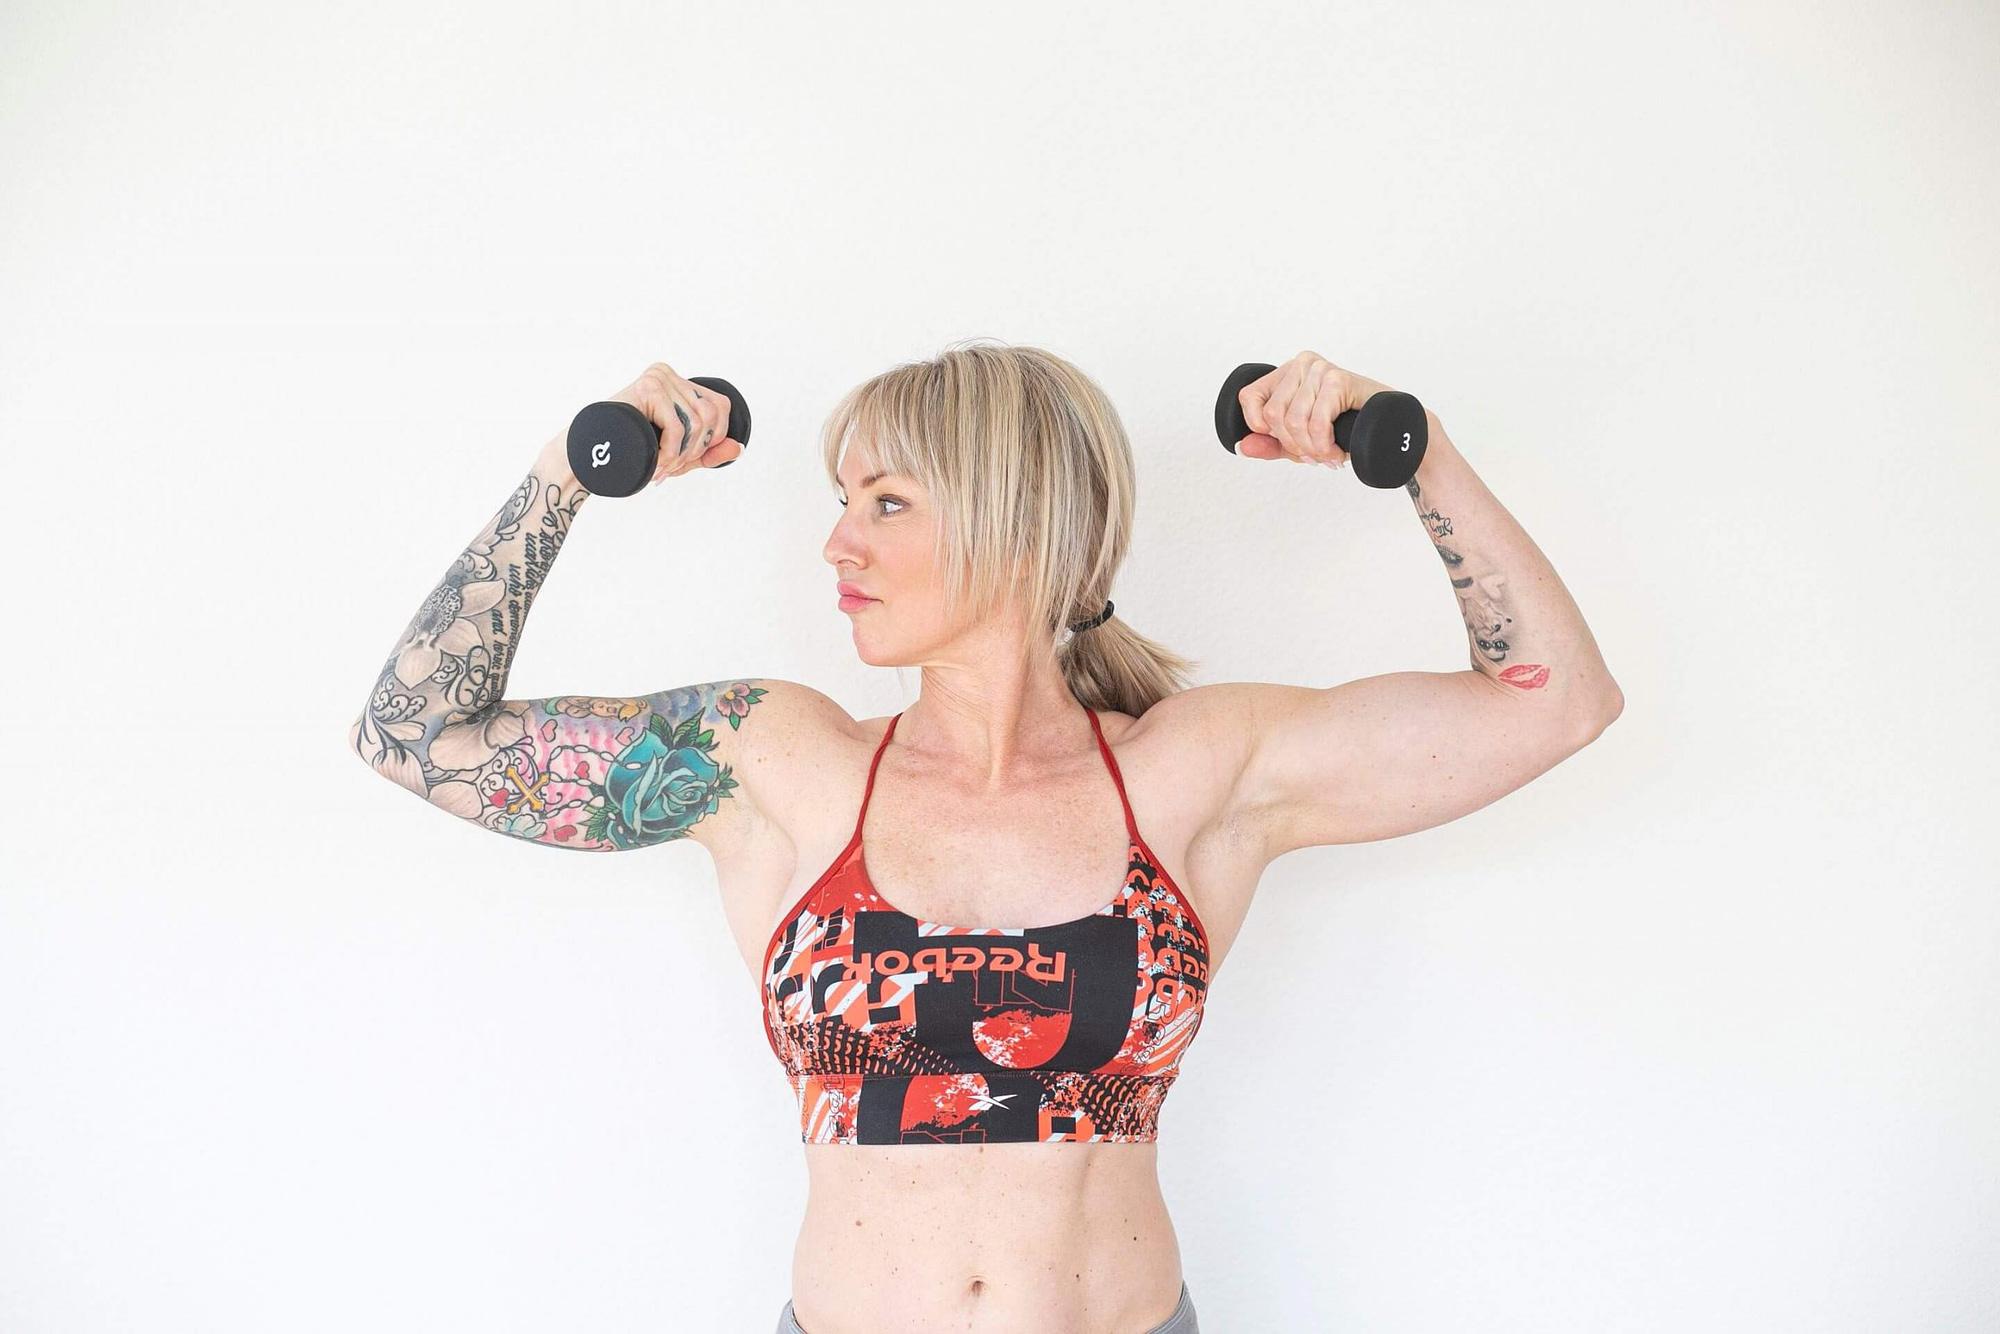 jenn carrasco holding weights